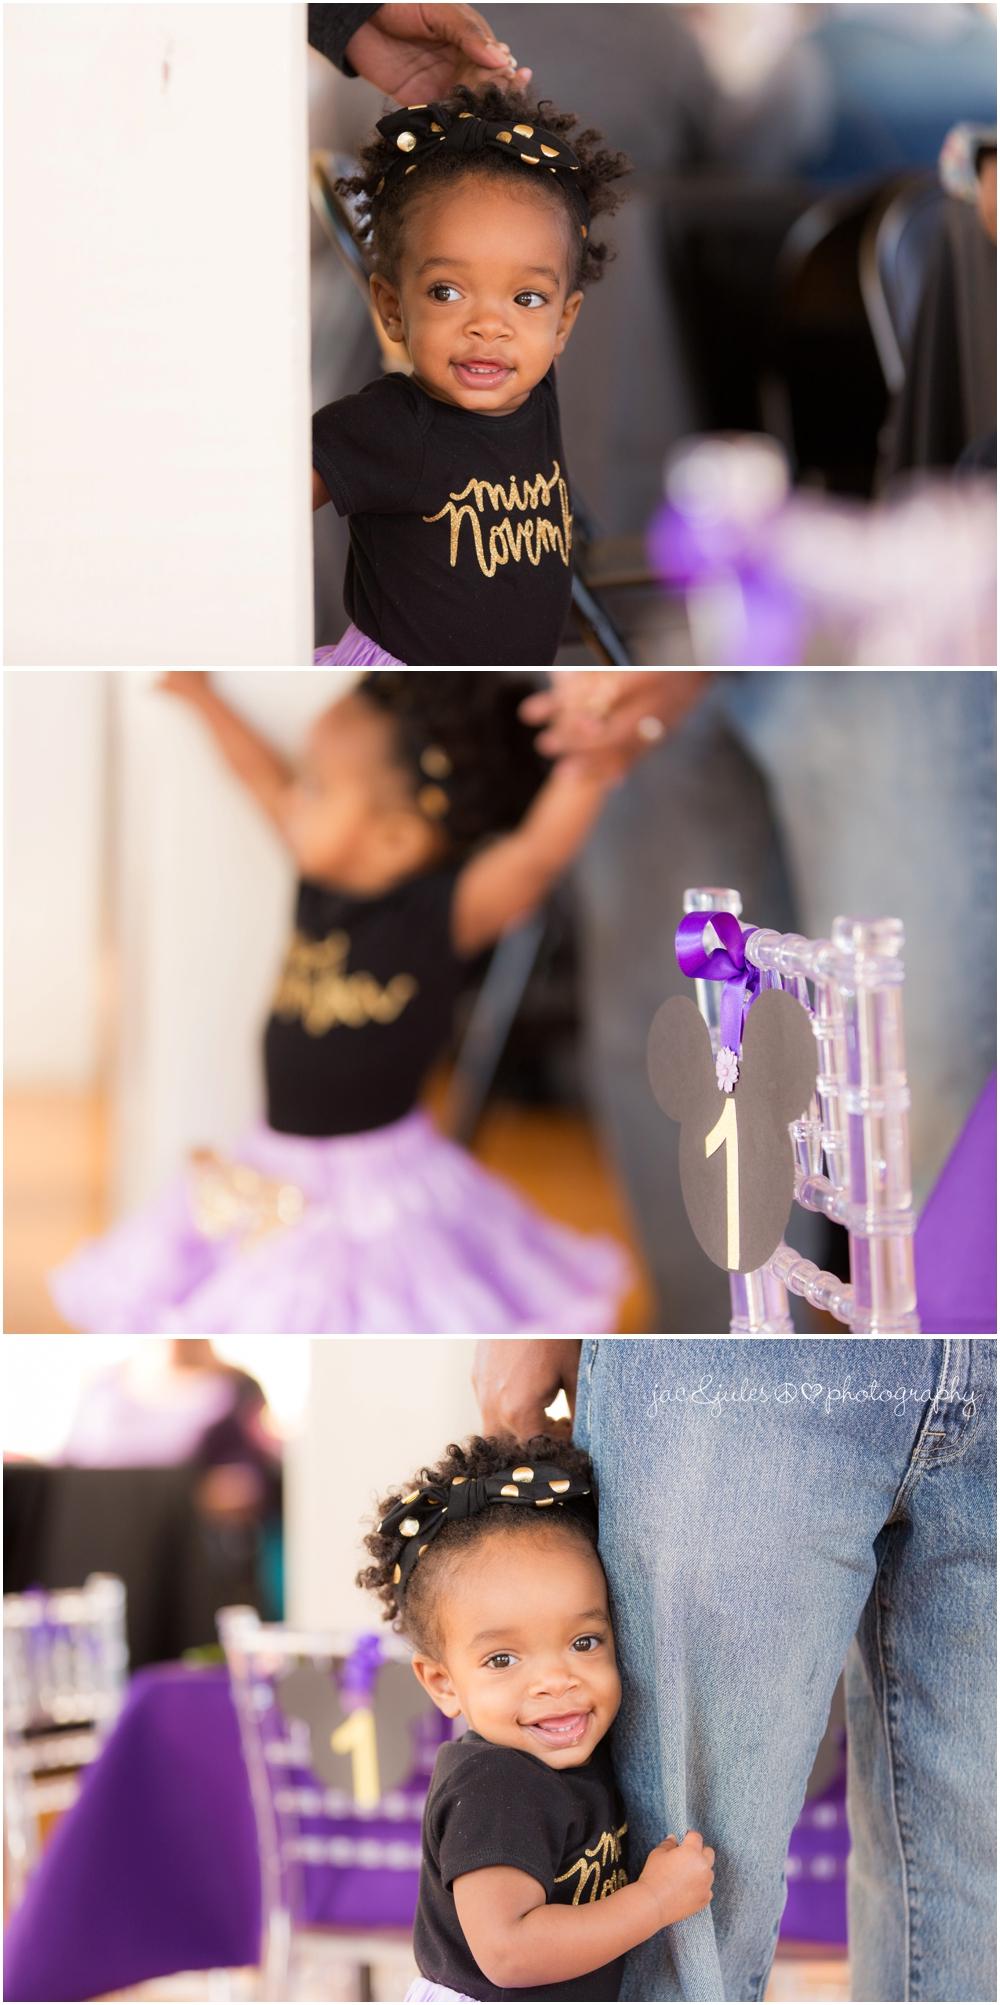 jacnjules photographs birthday girl at Lotus Studios in Highland Park